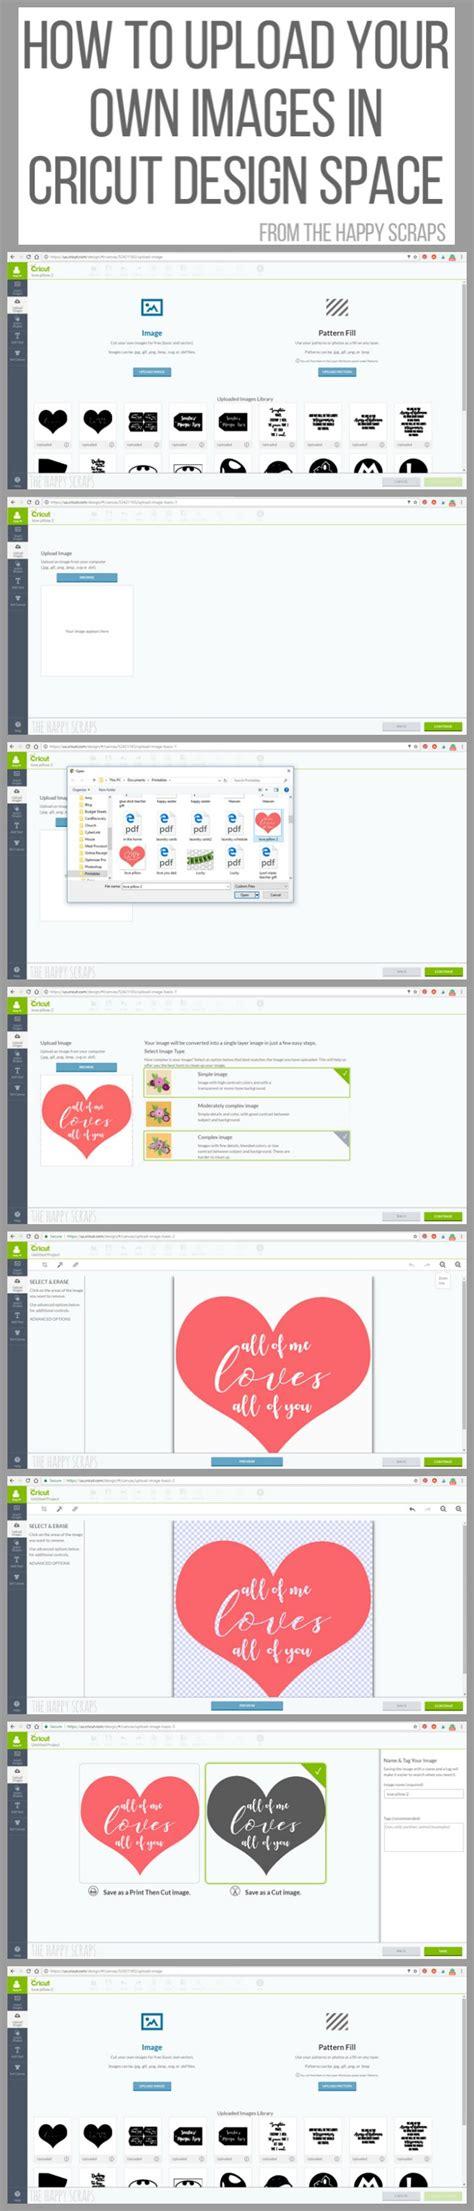 home design ipad tutorial home design ipad tutorial get schooled online education